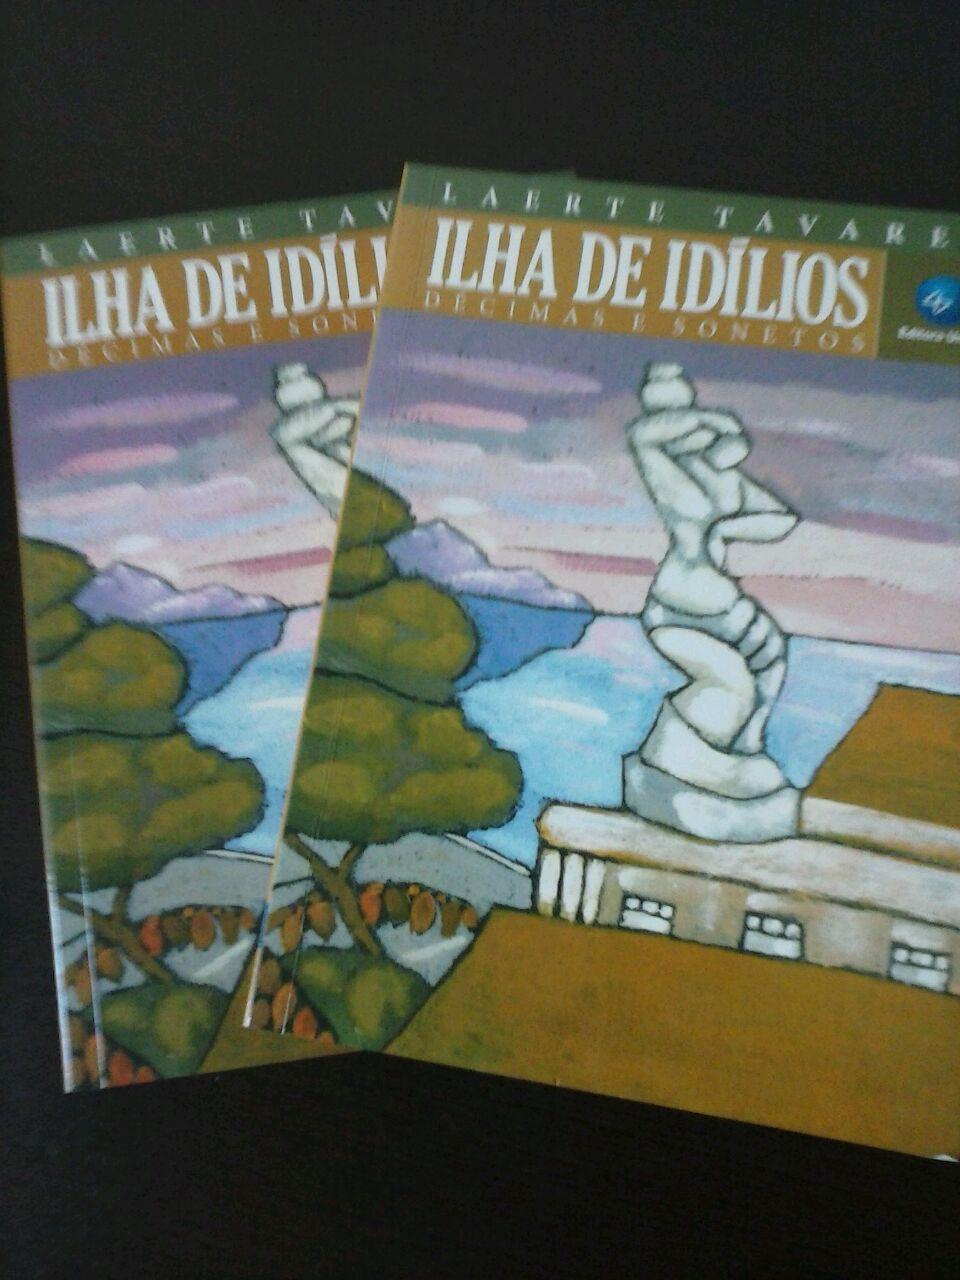 Ilha de Idílios - publicado pela Ed: UNISUL \ Universidade Catarinense